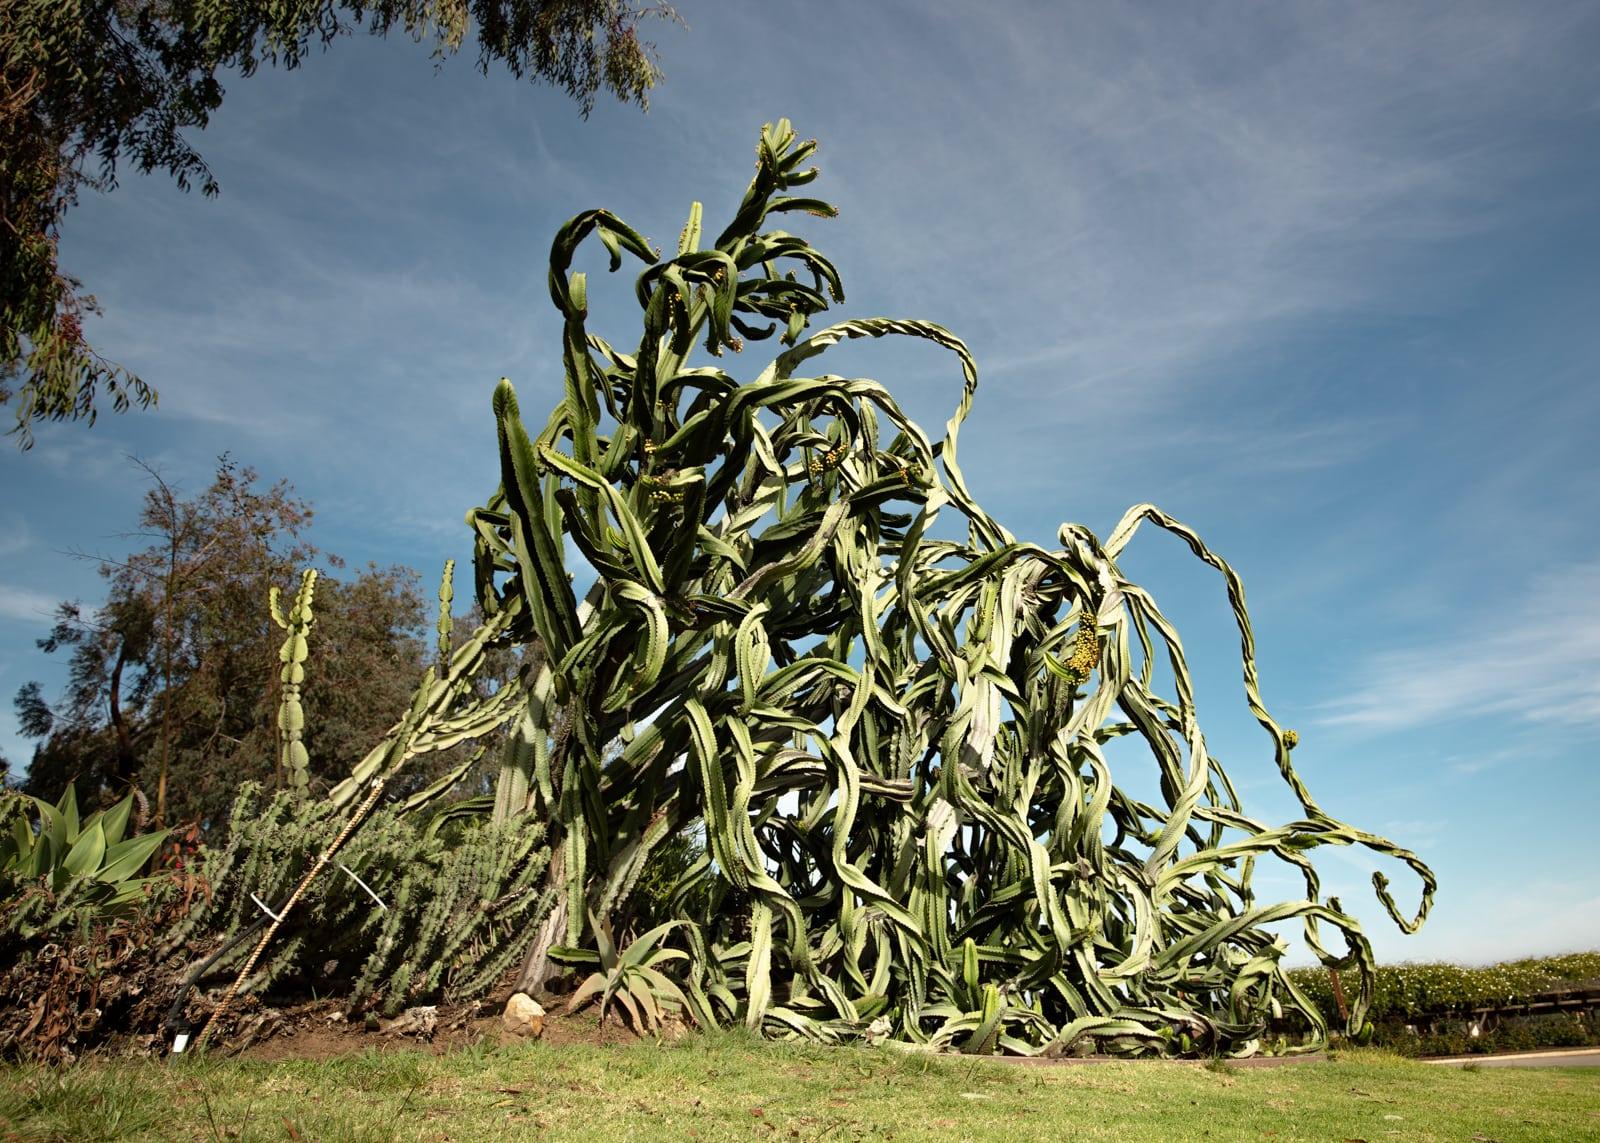 Candelabra tree (Euphorbia ingens) at the Desert Garden, Balboa Park, San Diego